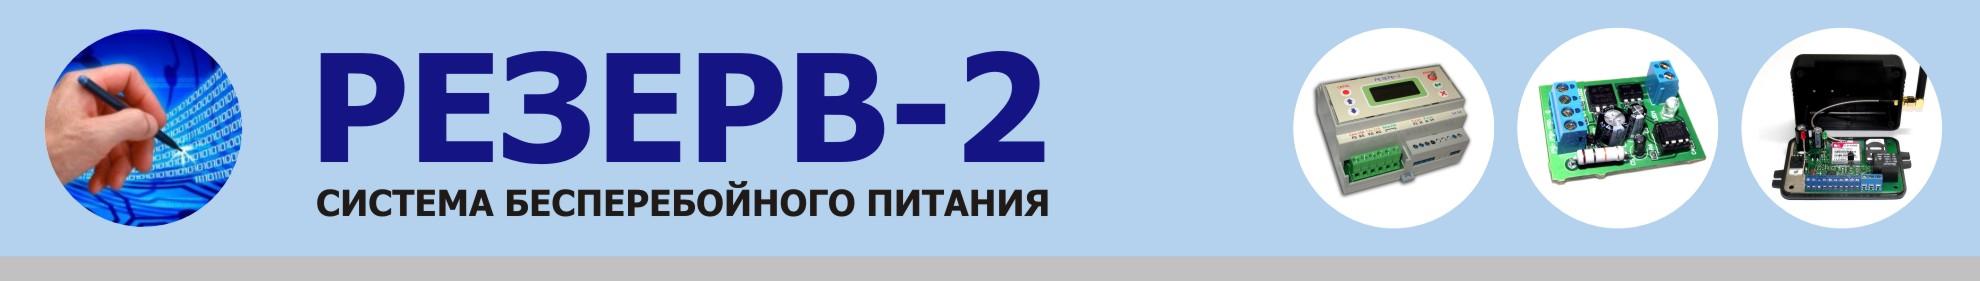 Резерв2.рф